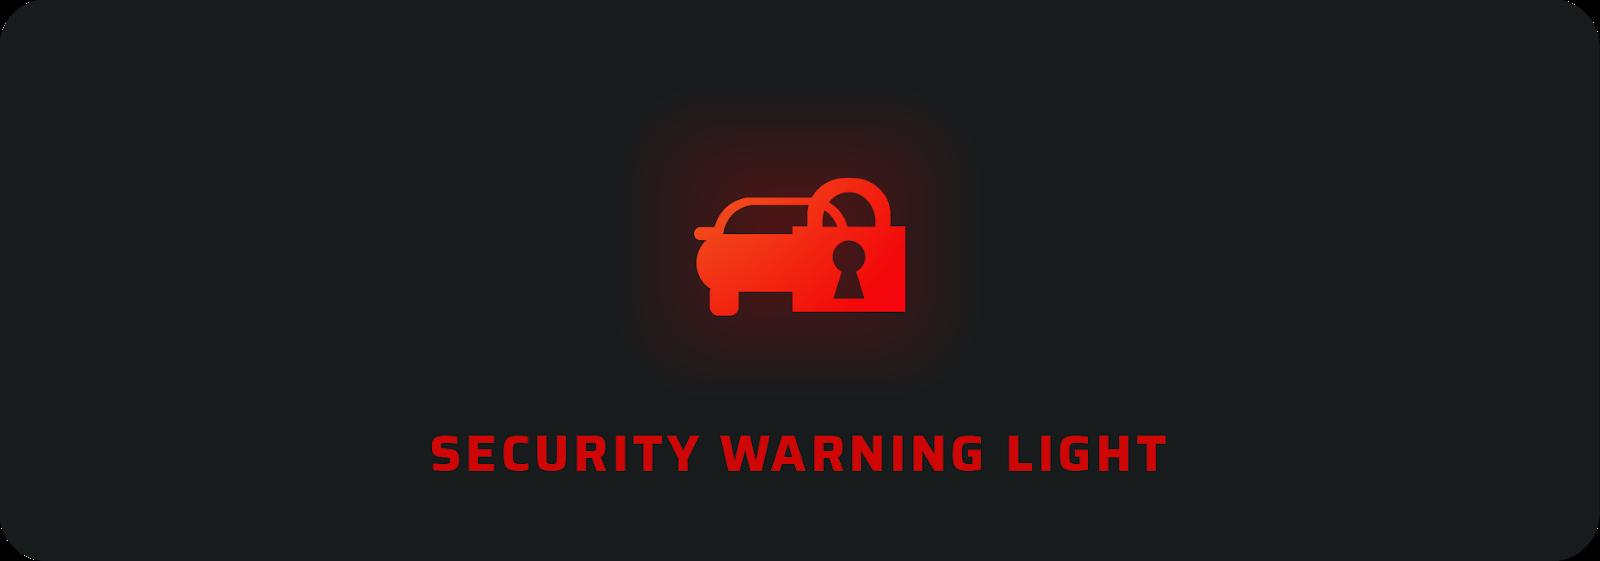 Security warning light